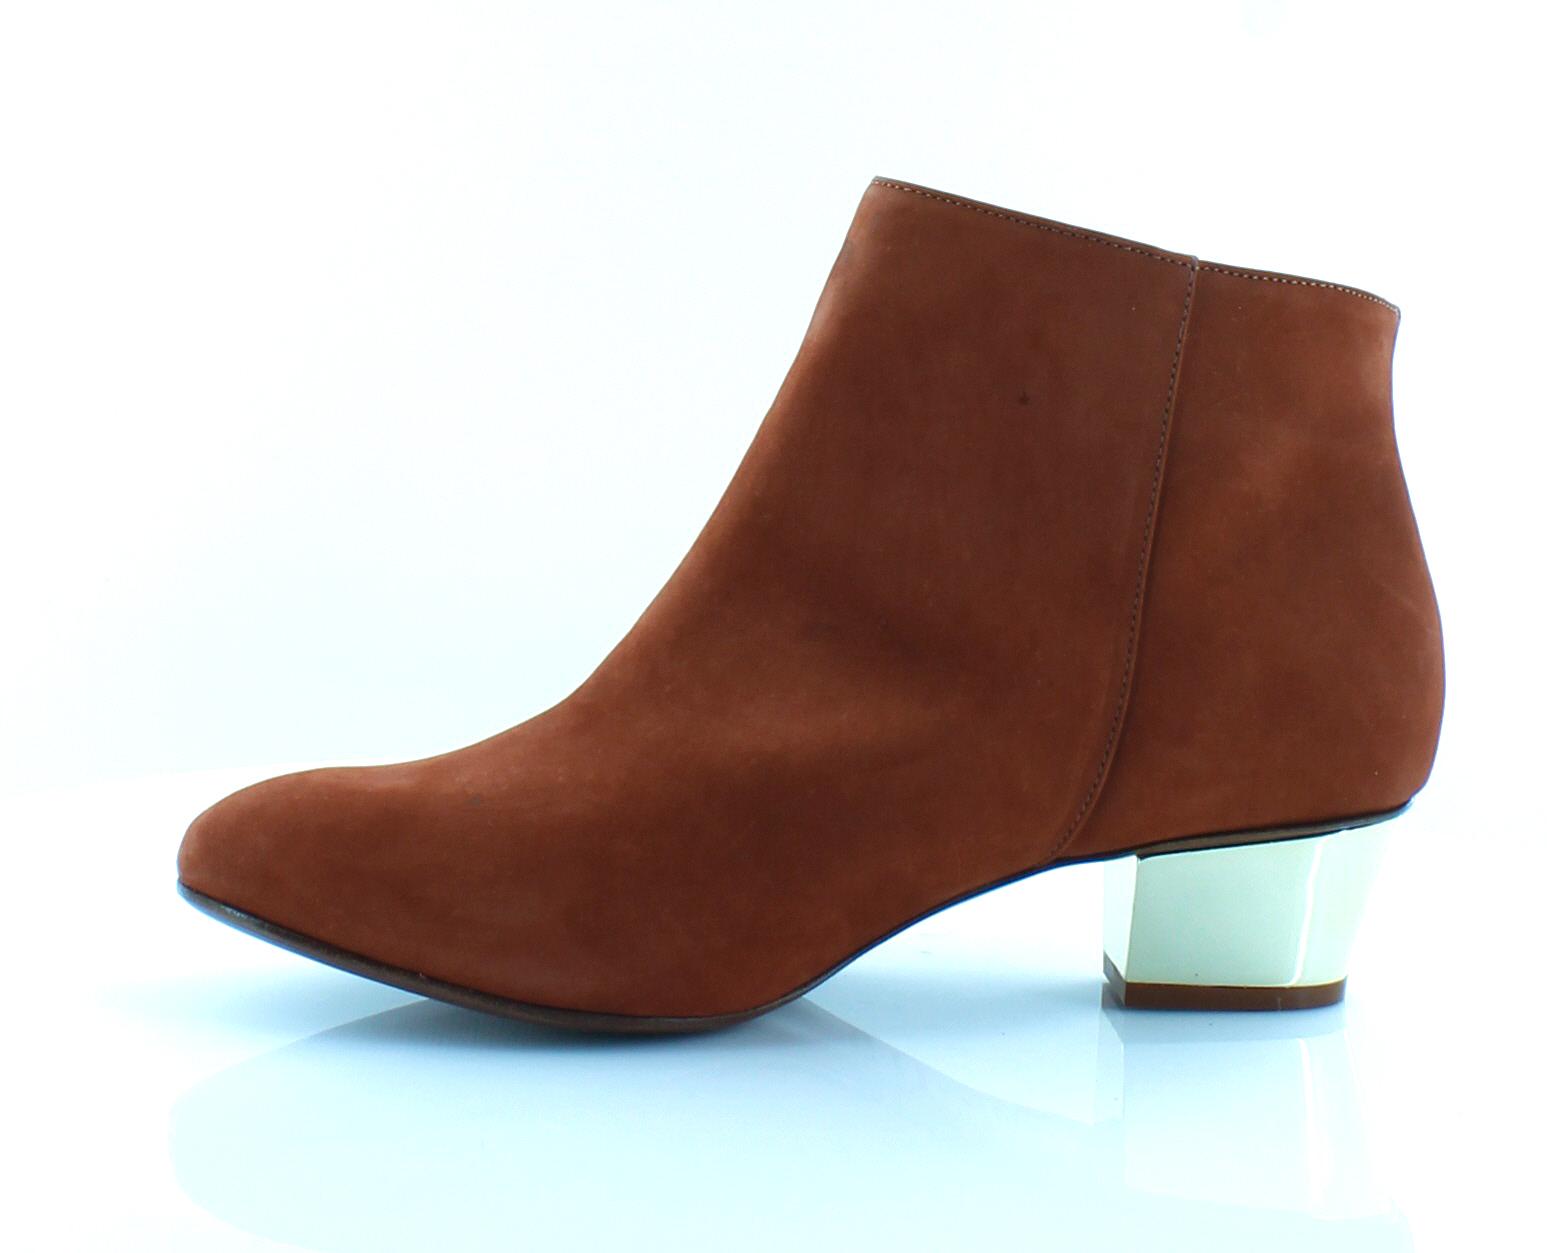 pierazzoli gomme arezzo shoes - photo#13